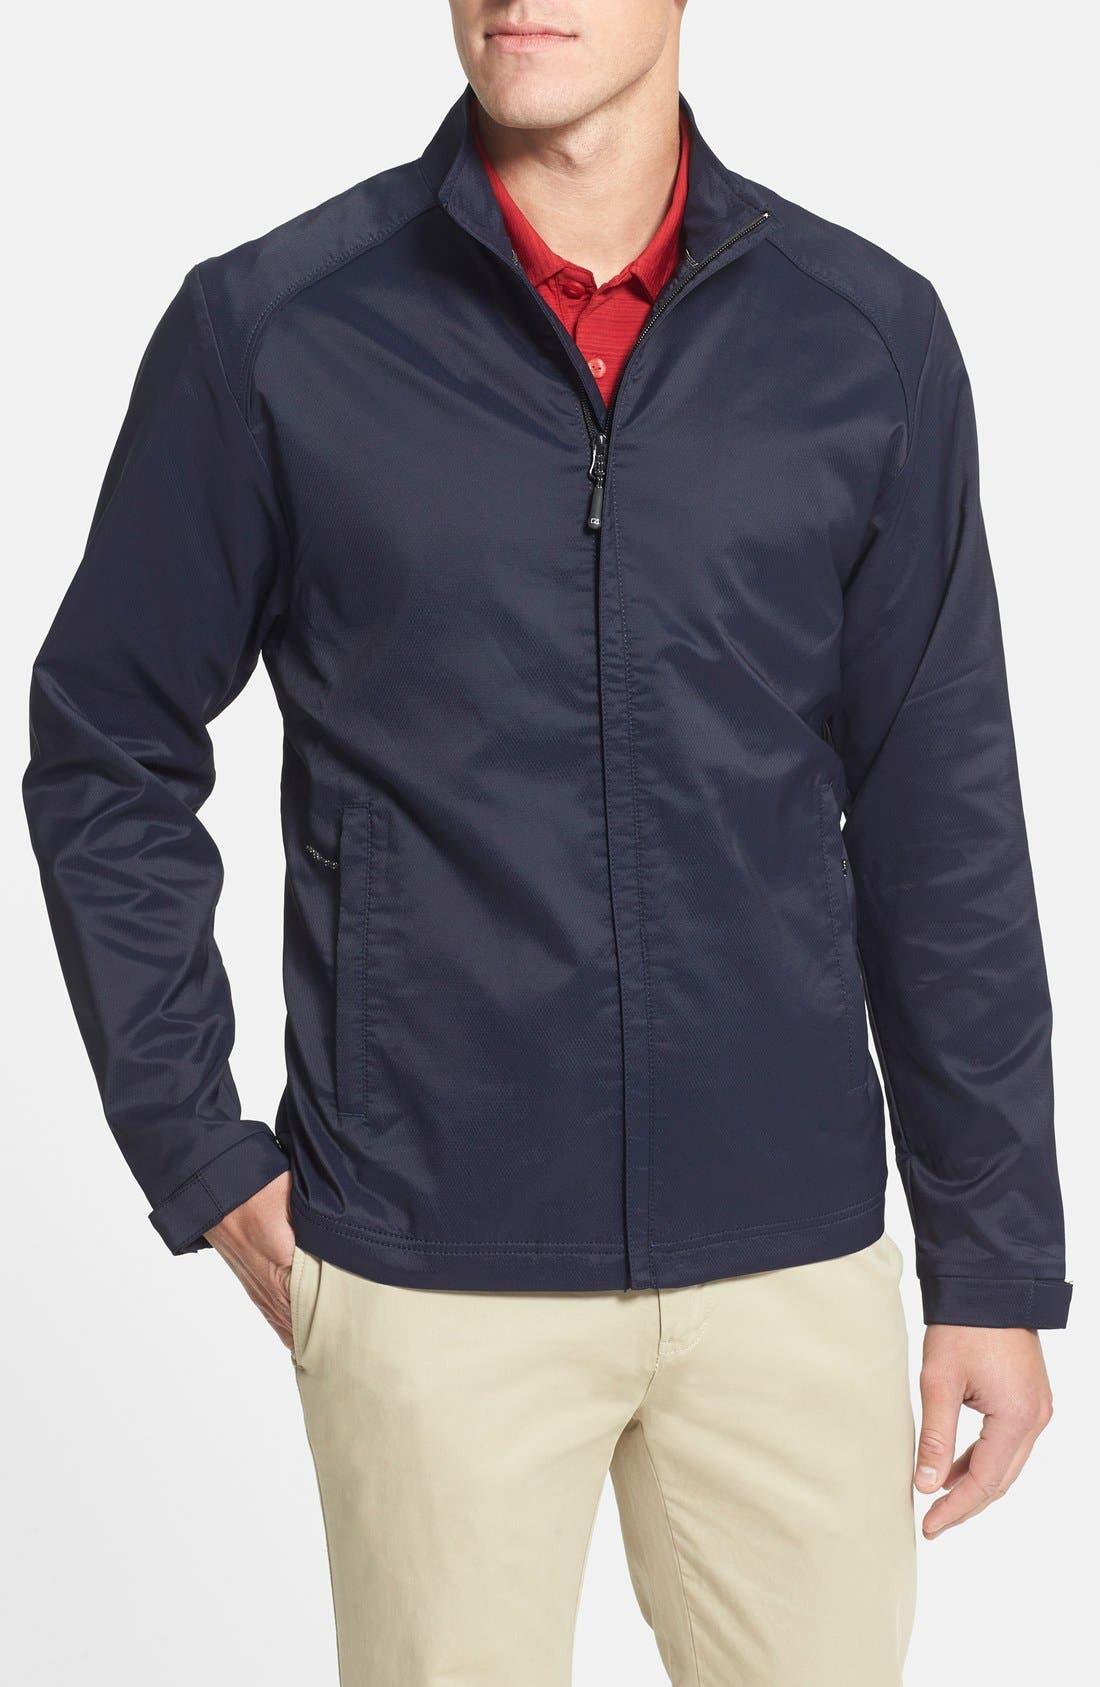 Blakely WeatherTec<sup>®</sup> Wind & Water Resistant Full Zip Jacket,                         Main,                         color, Liberty Navy